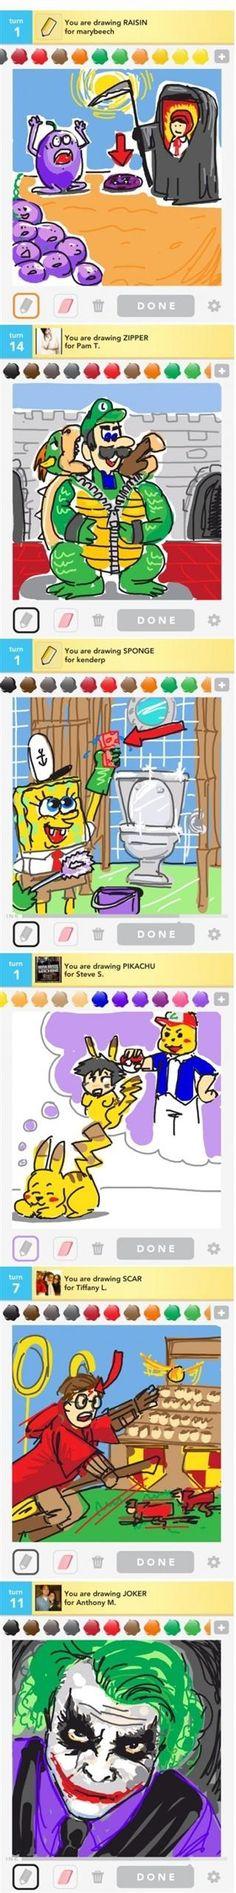 Creative draw something